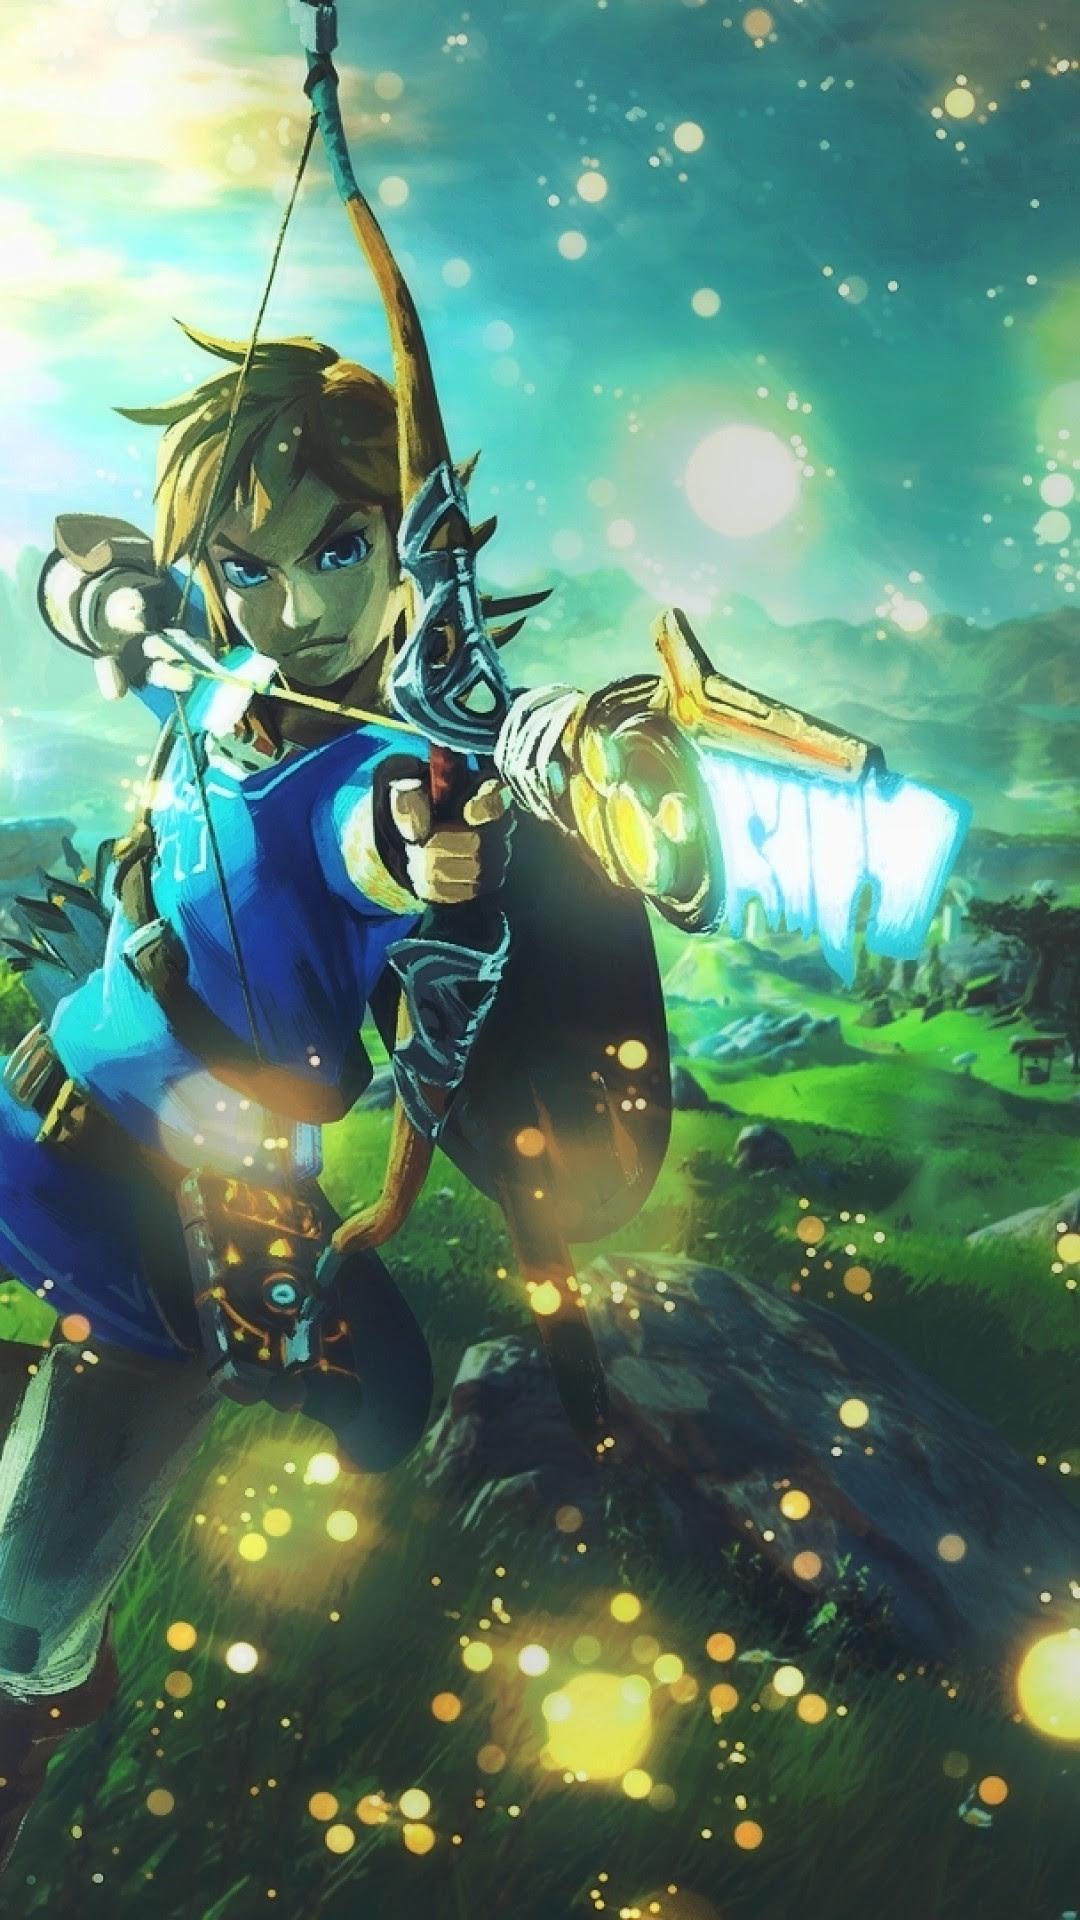 Legend of Zelda Link Wallpaper 70+ images